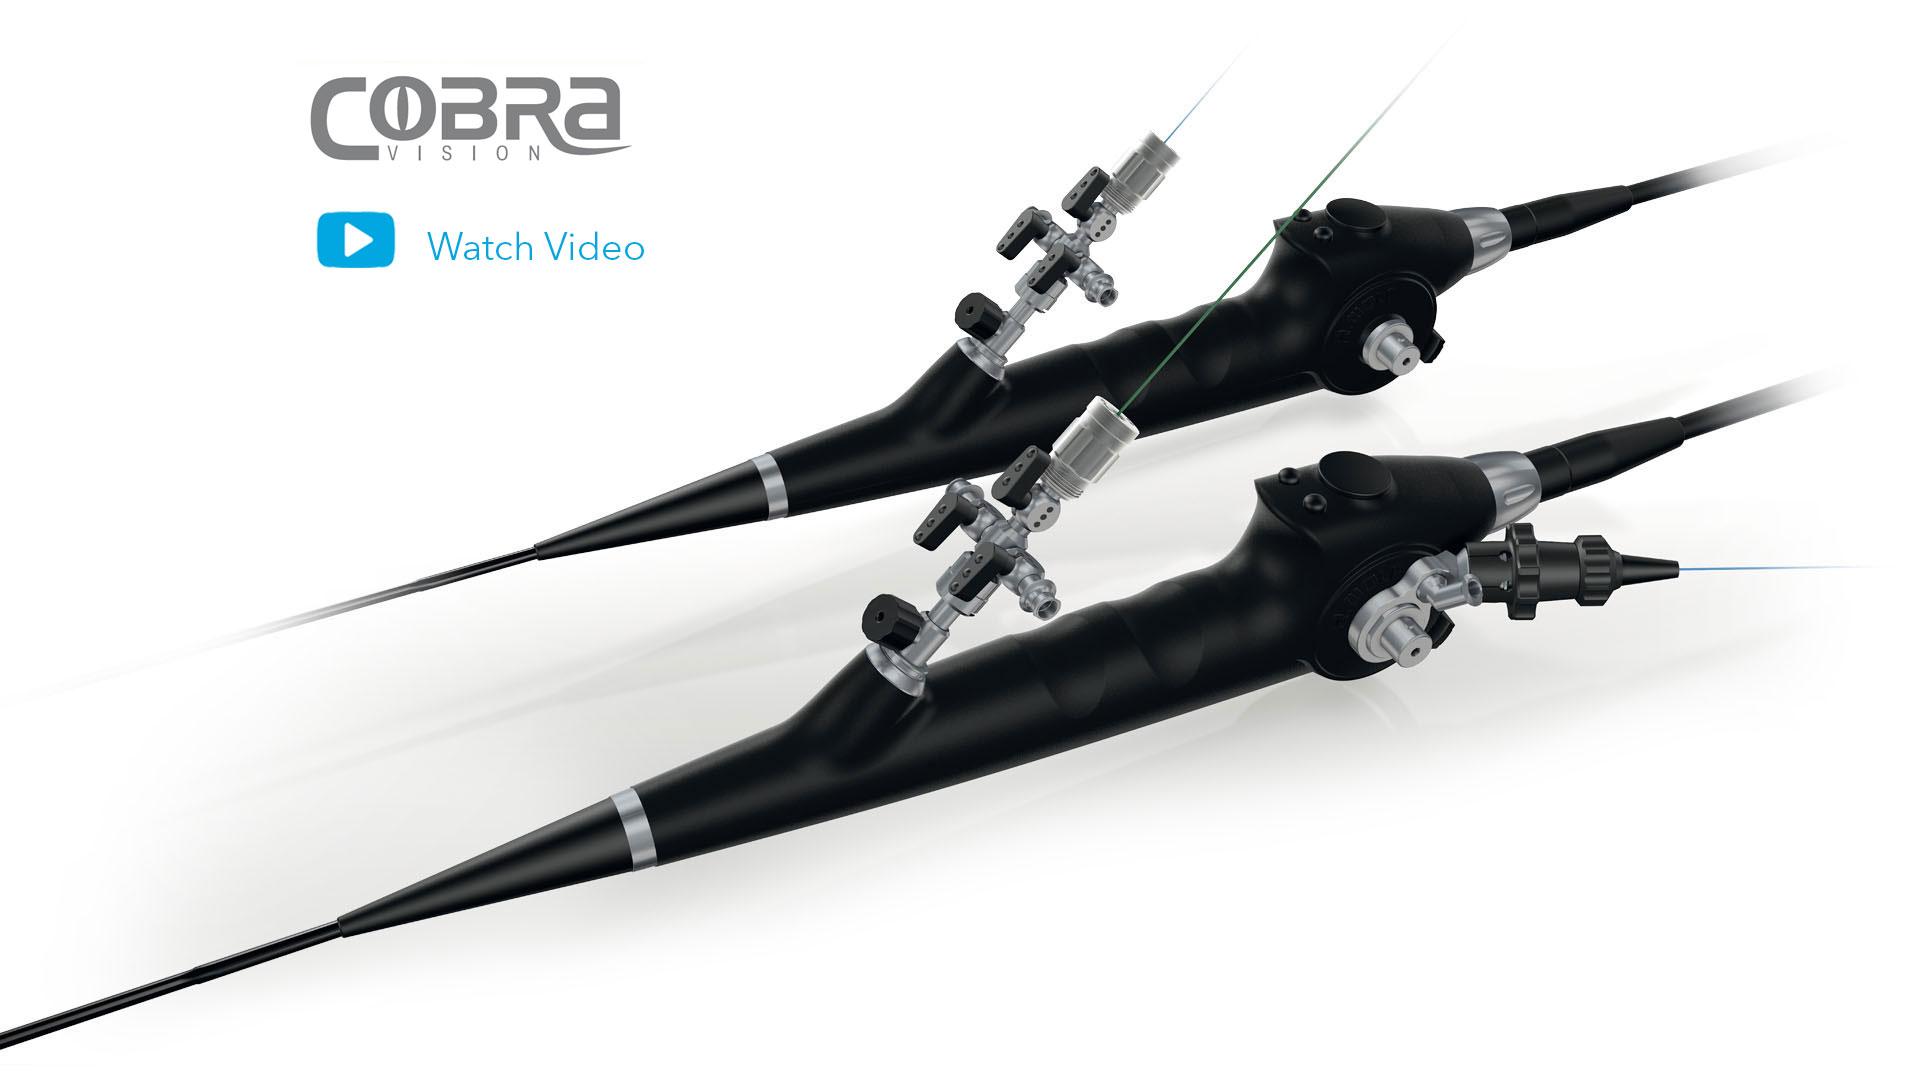 COBRA vision